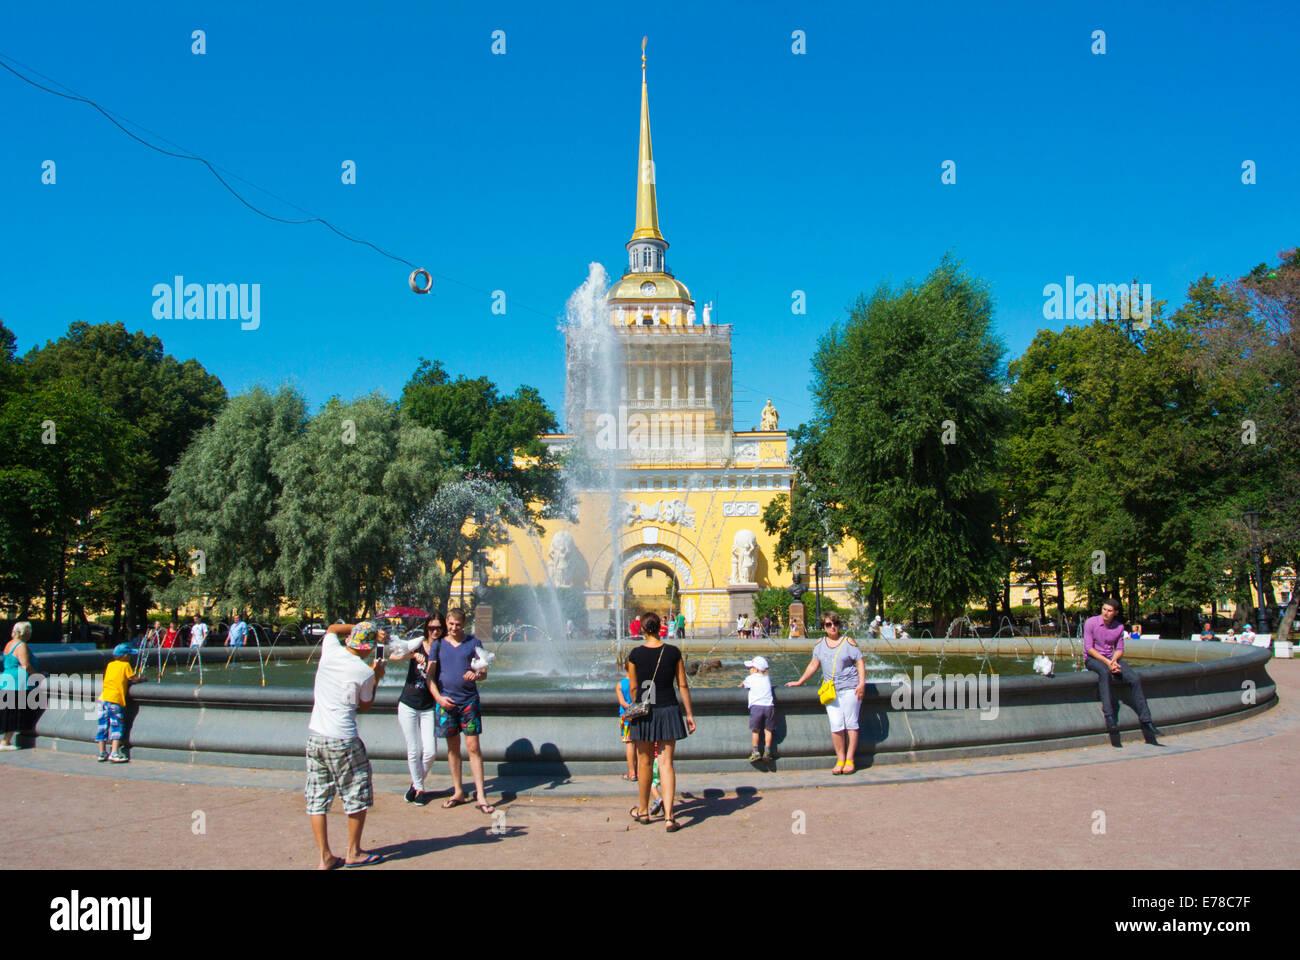 Admiralty building tower (1823), Alexander Garden, central Saint Petersburg, Russia, Europe - Stock Image